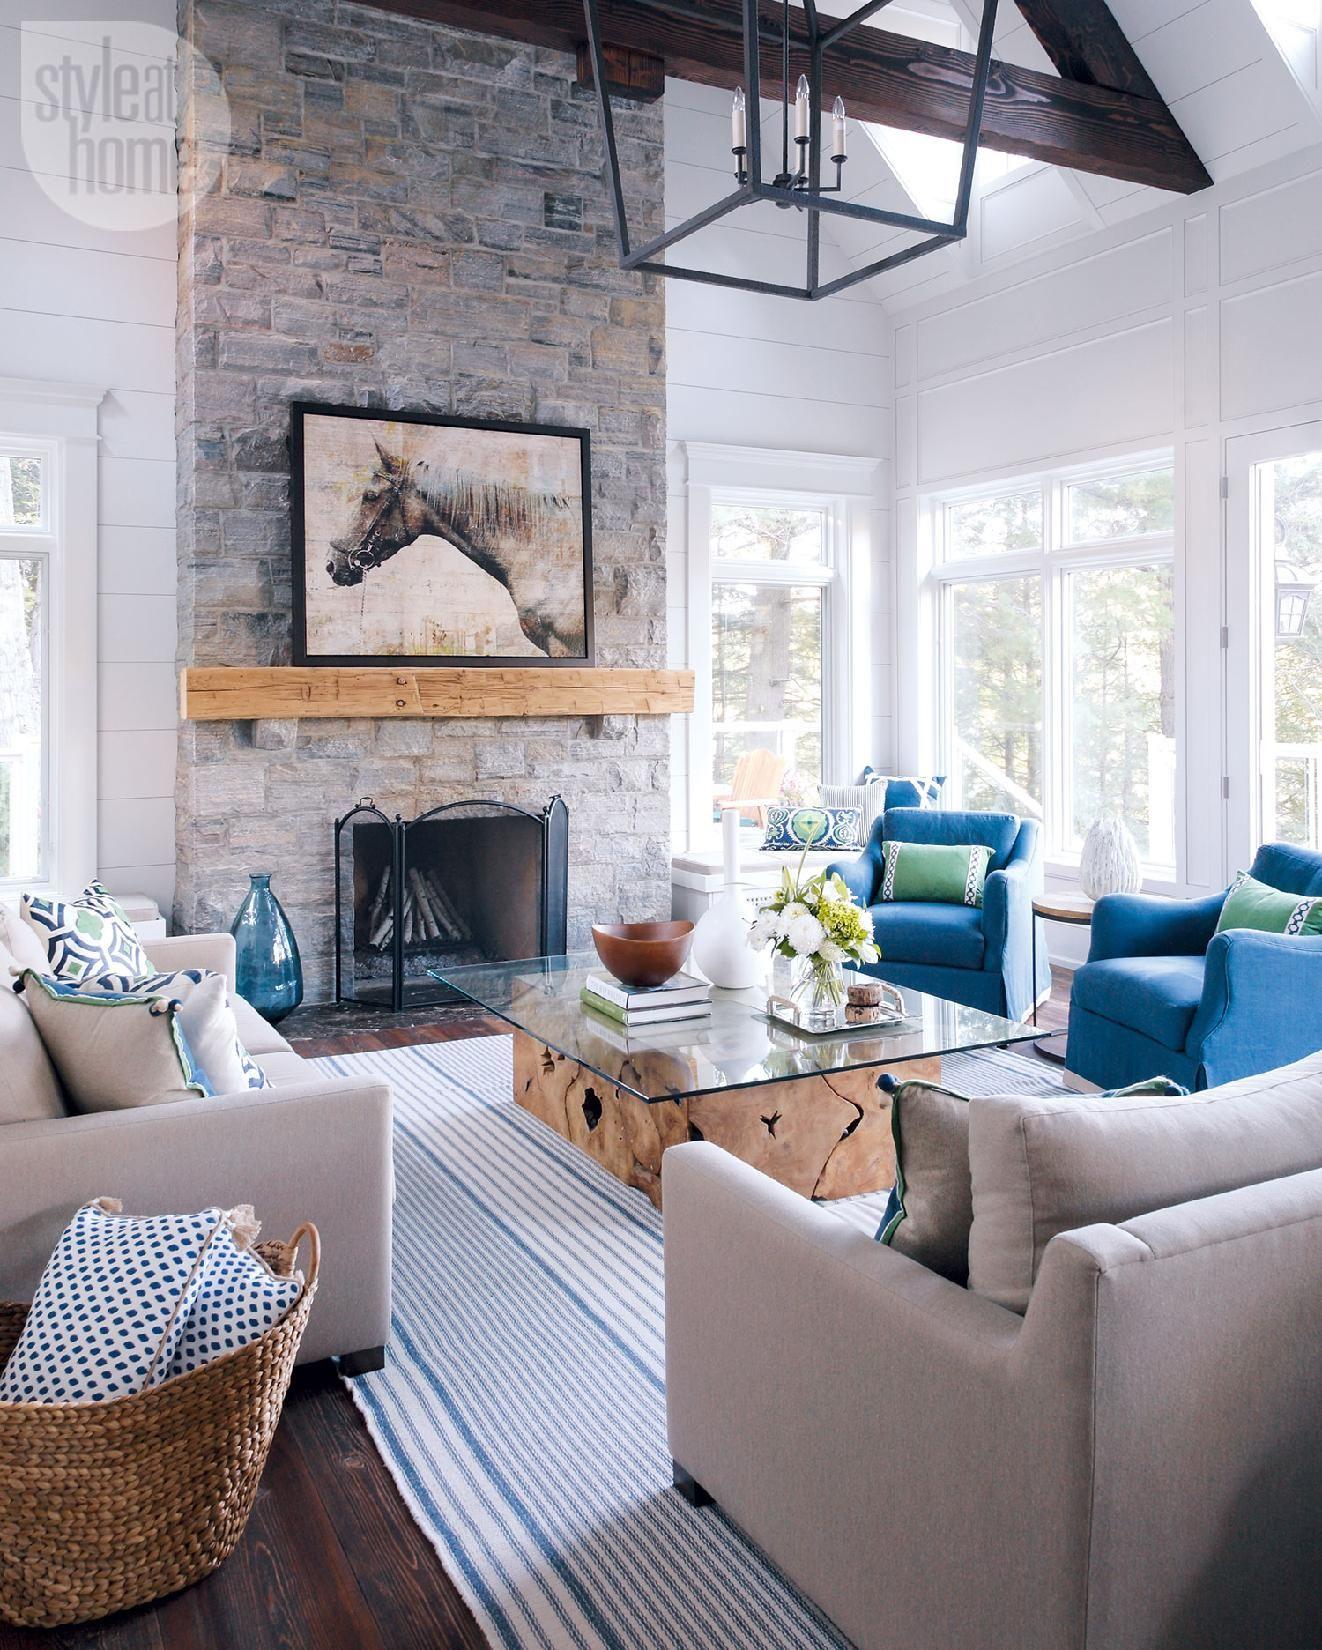 25 Stylish Summer Homes Living Room